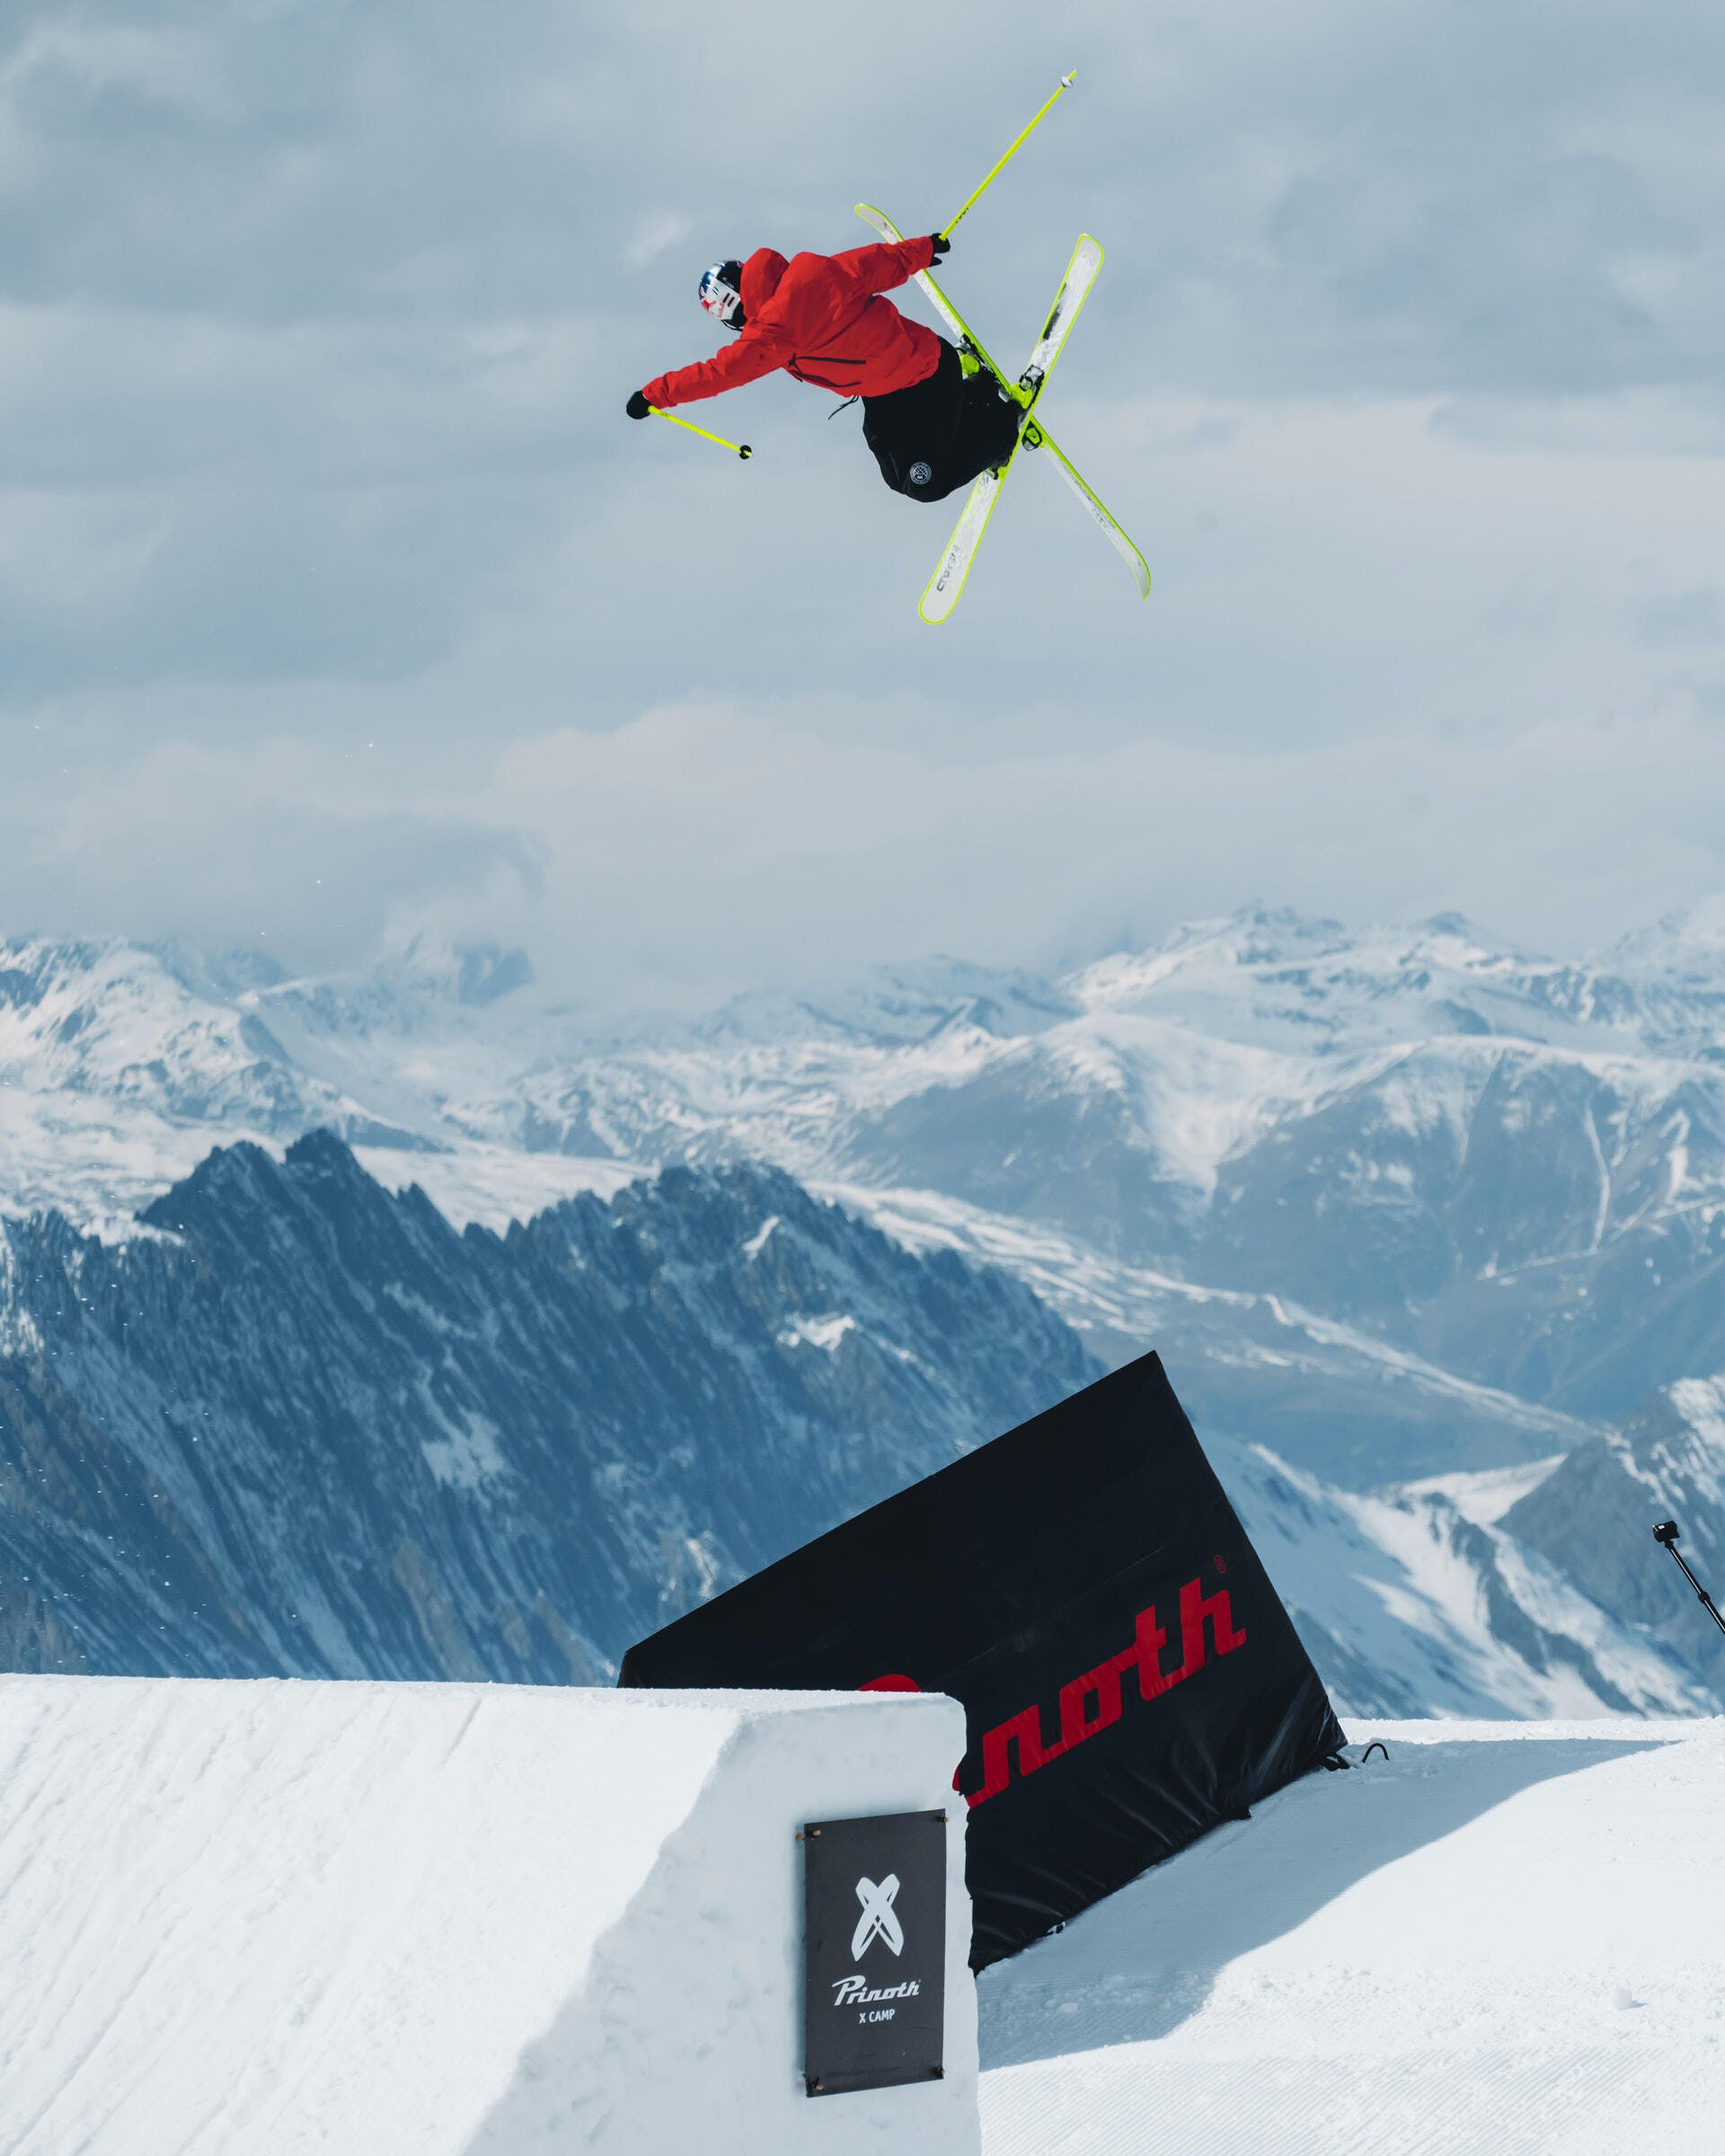 hitting bigger jumps on skis